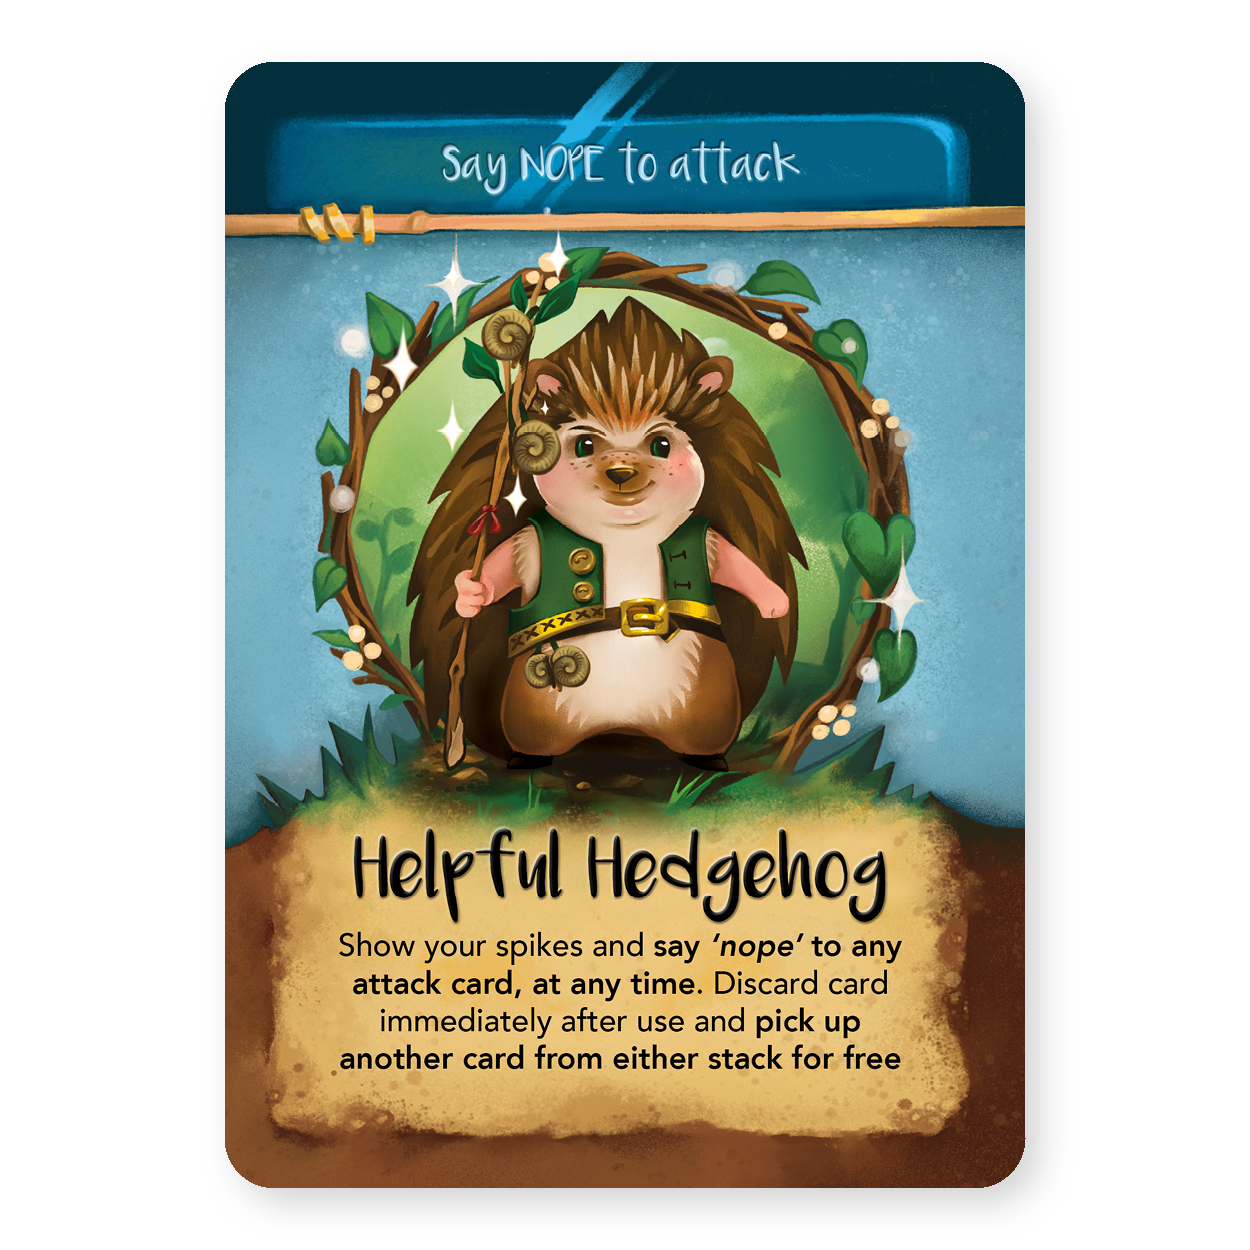 Helful Hedgehog from Plotalot Image courtesy of Moonstone Games